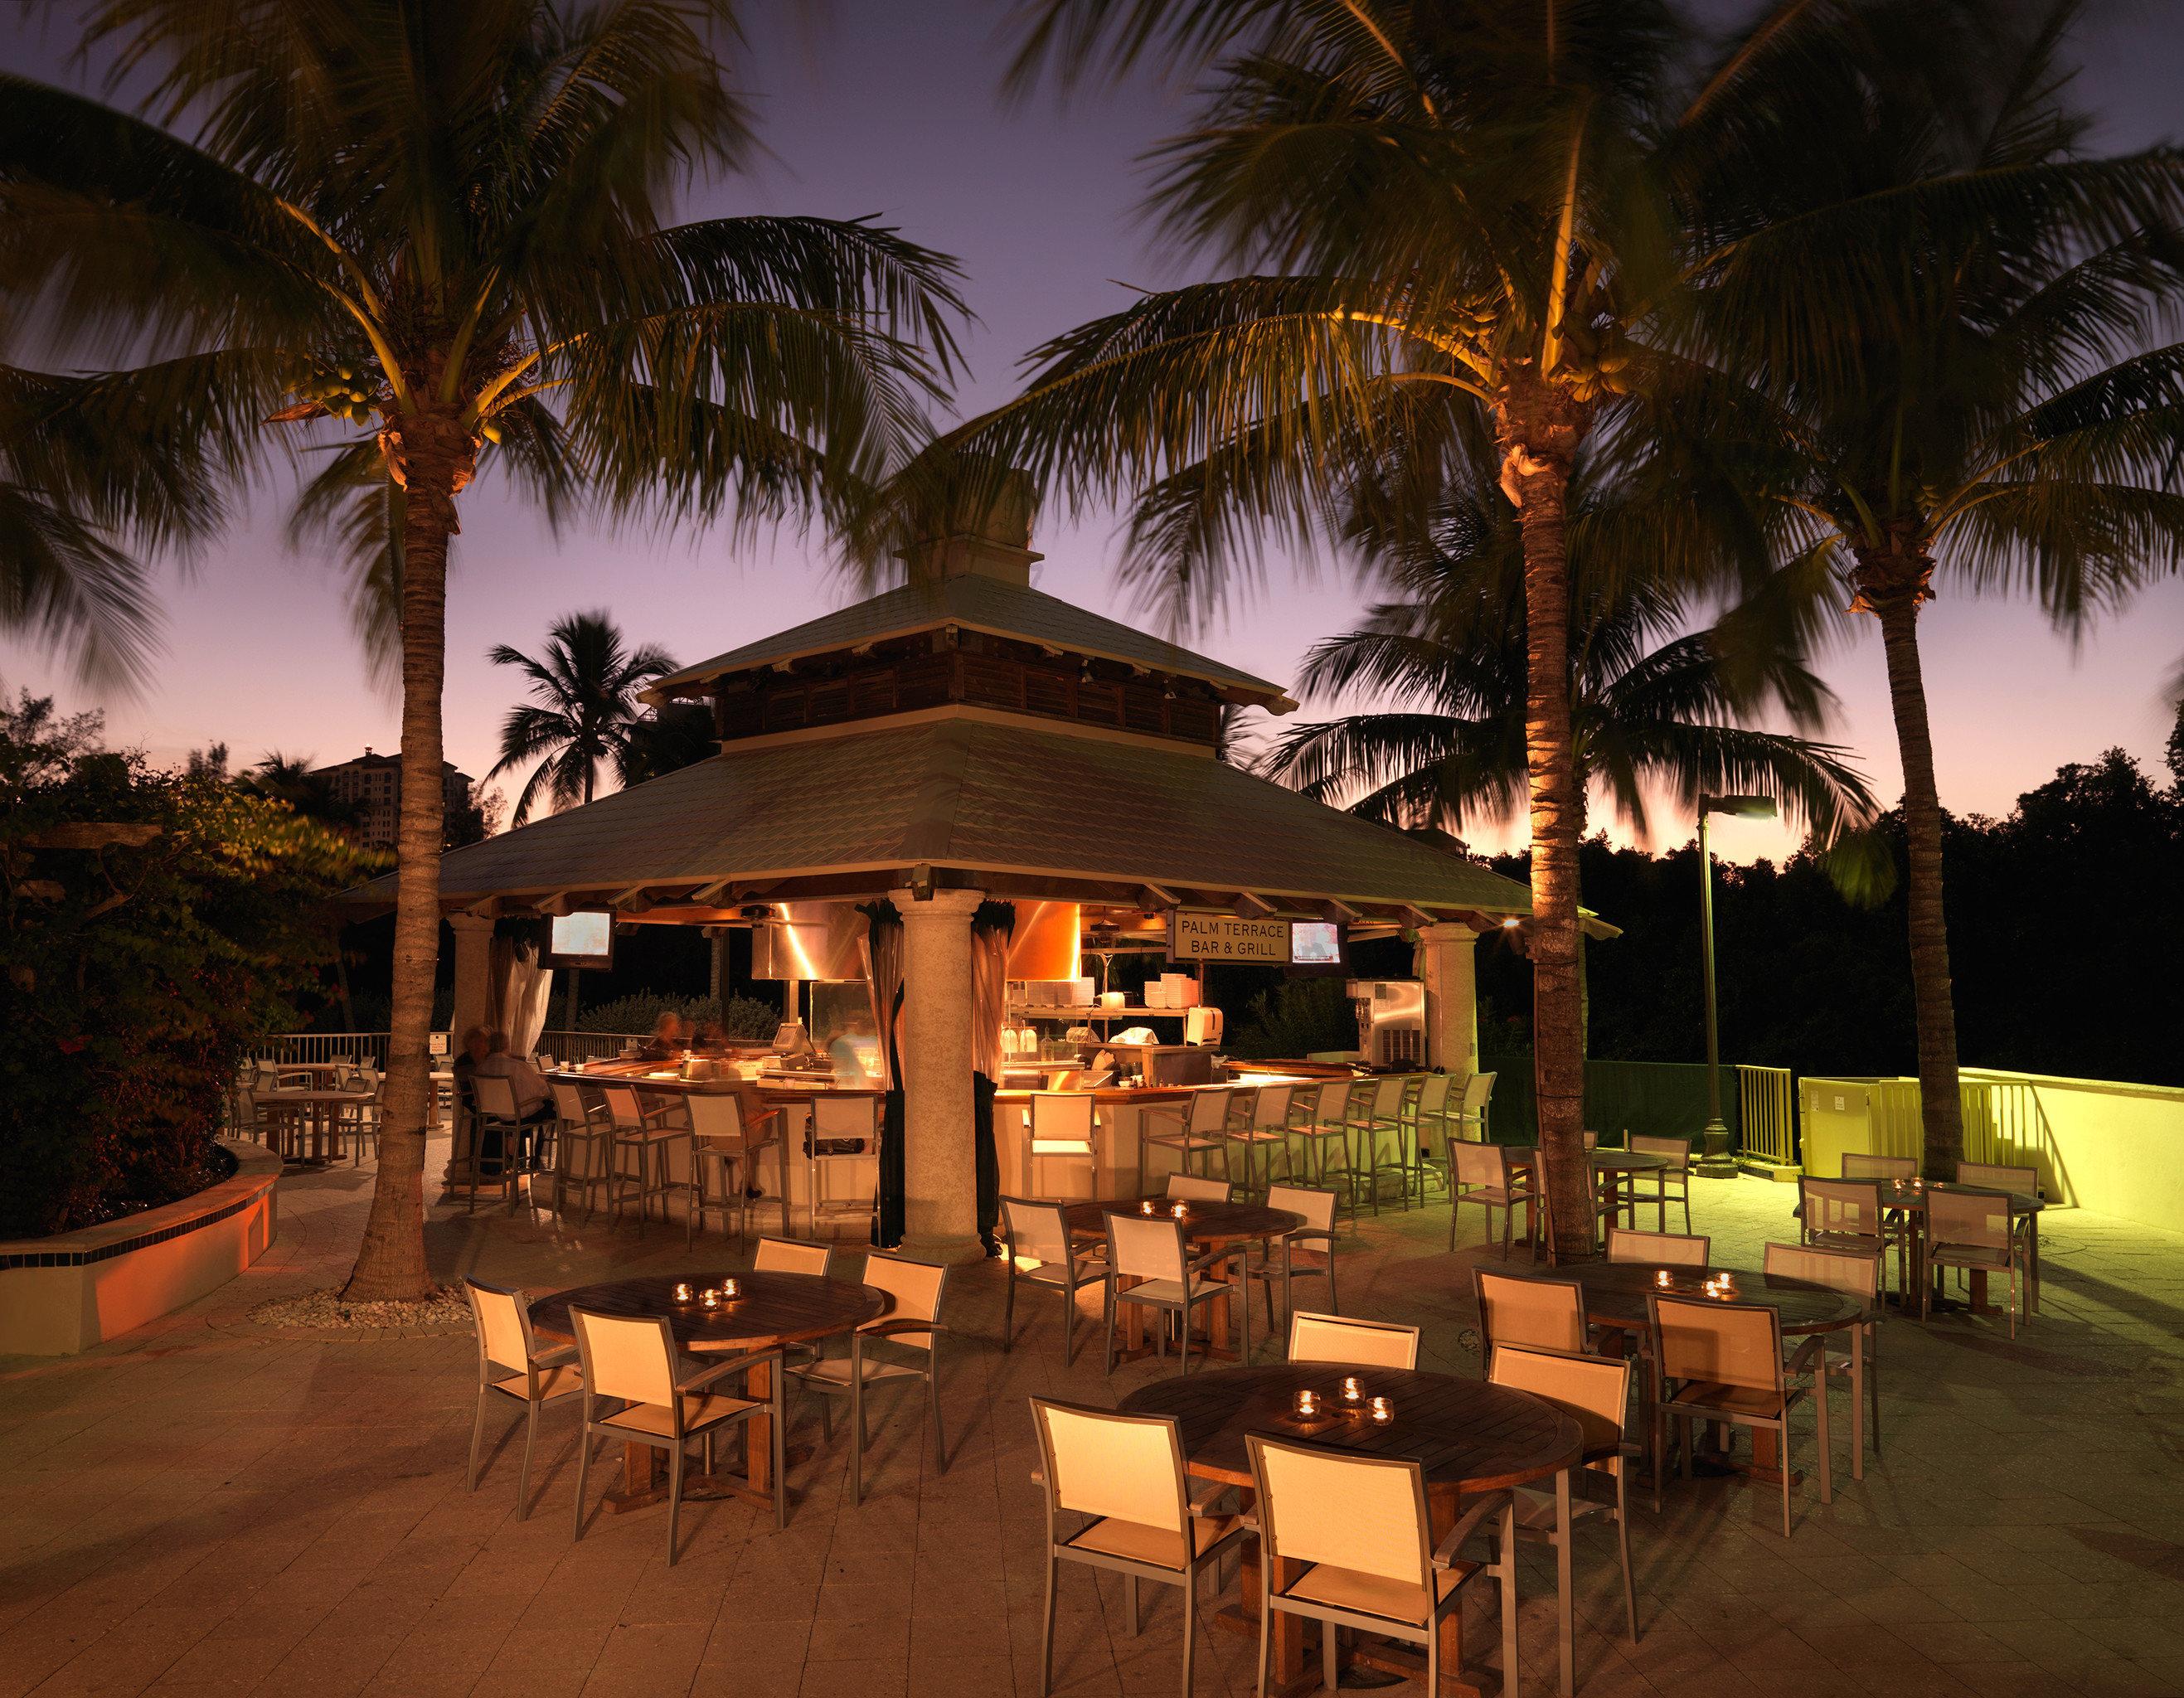 Bar Drink Outdoors Sunset Waterfront tree palm Resort restaurant night arecales evening hacienda Villa lined